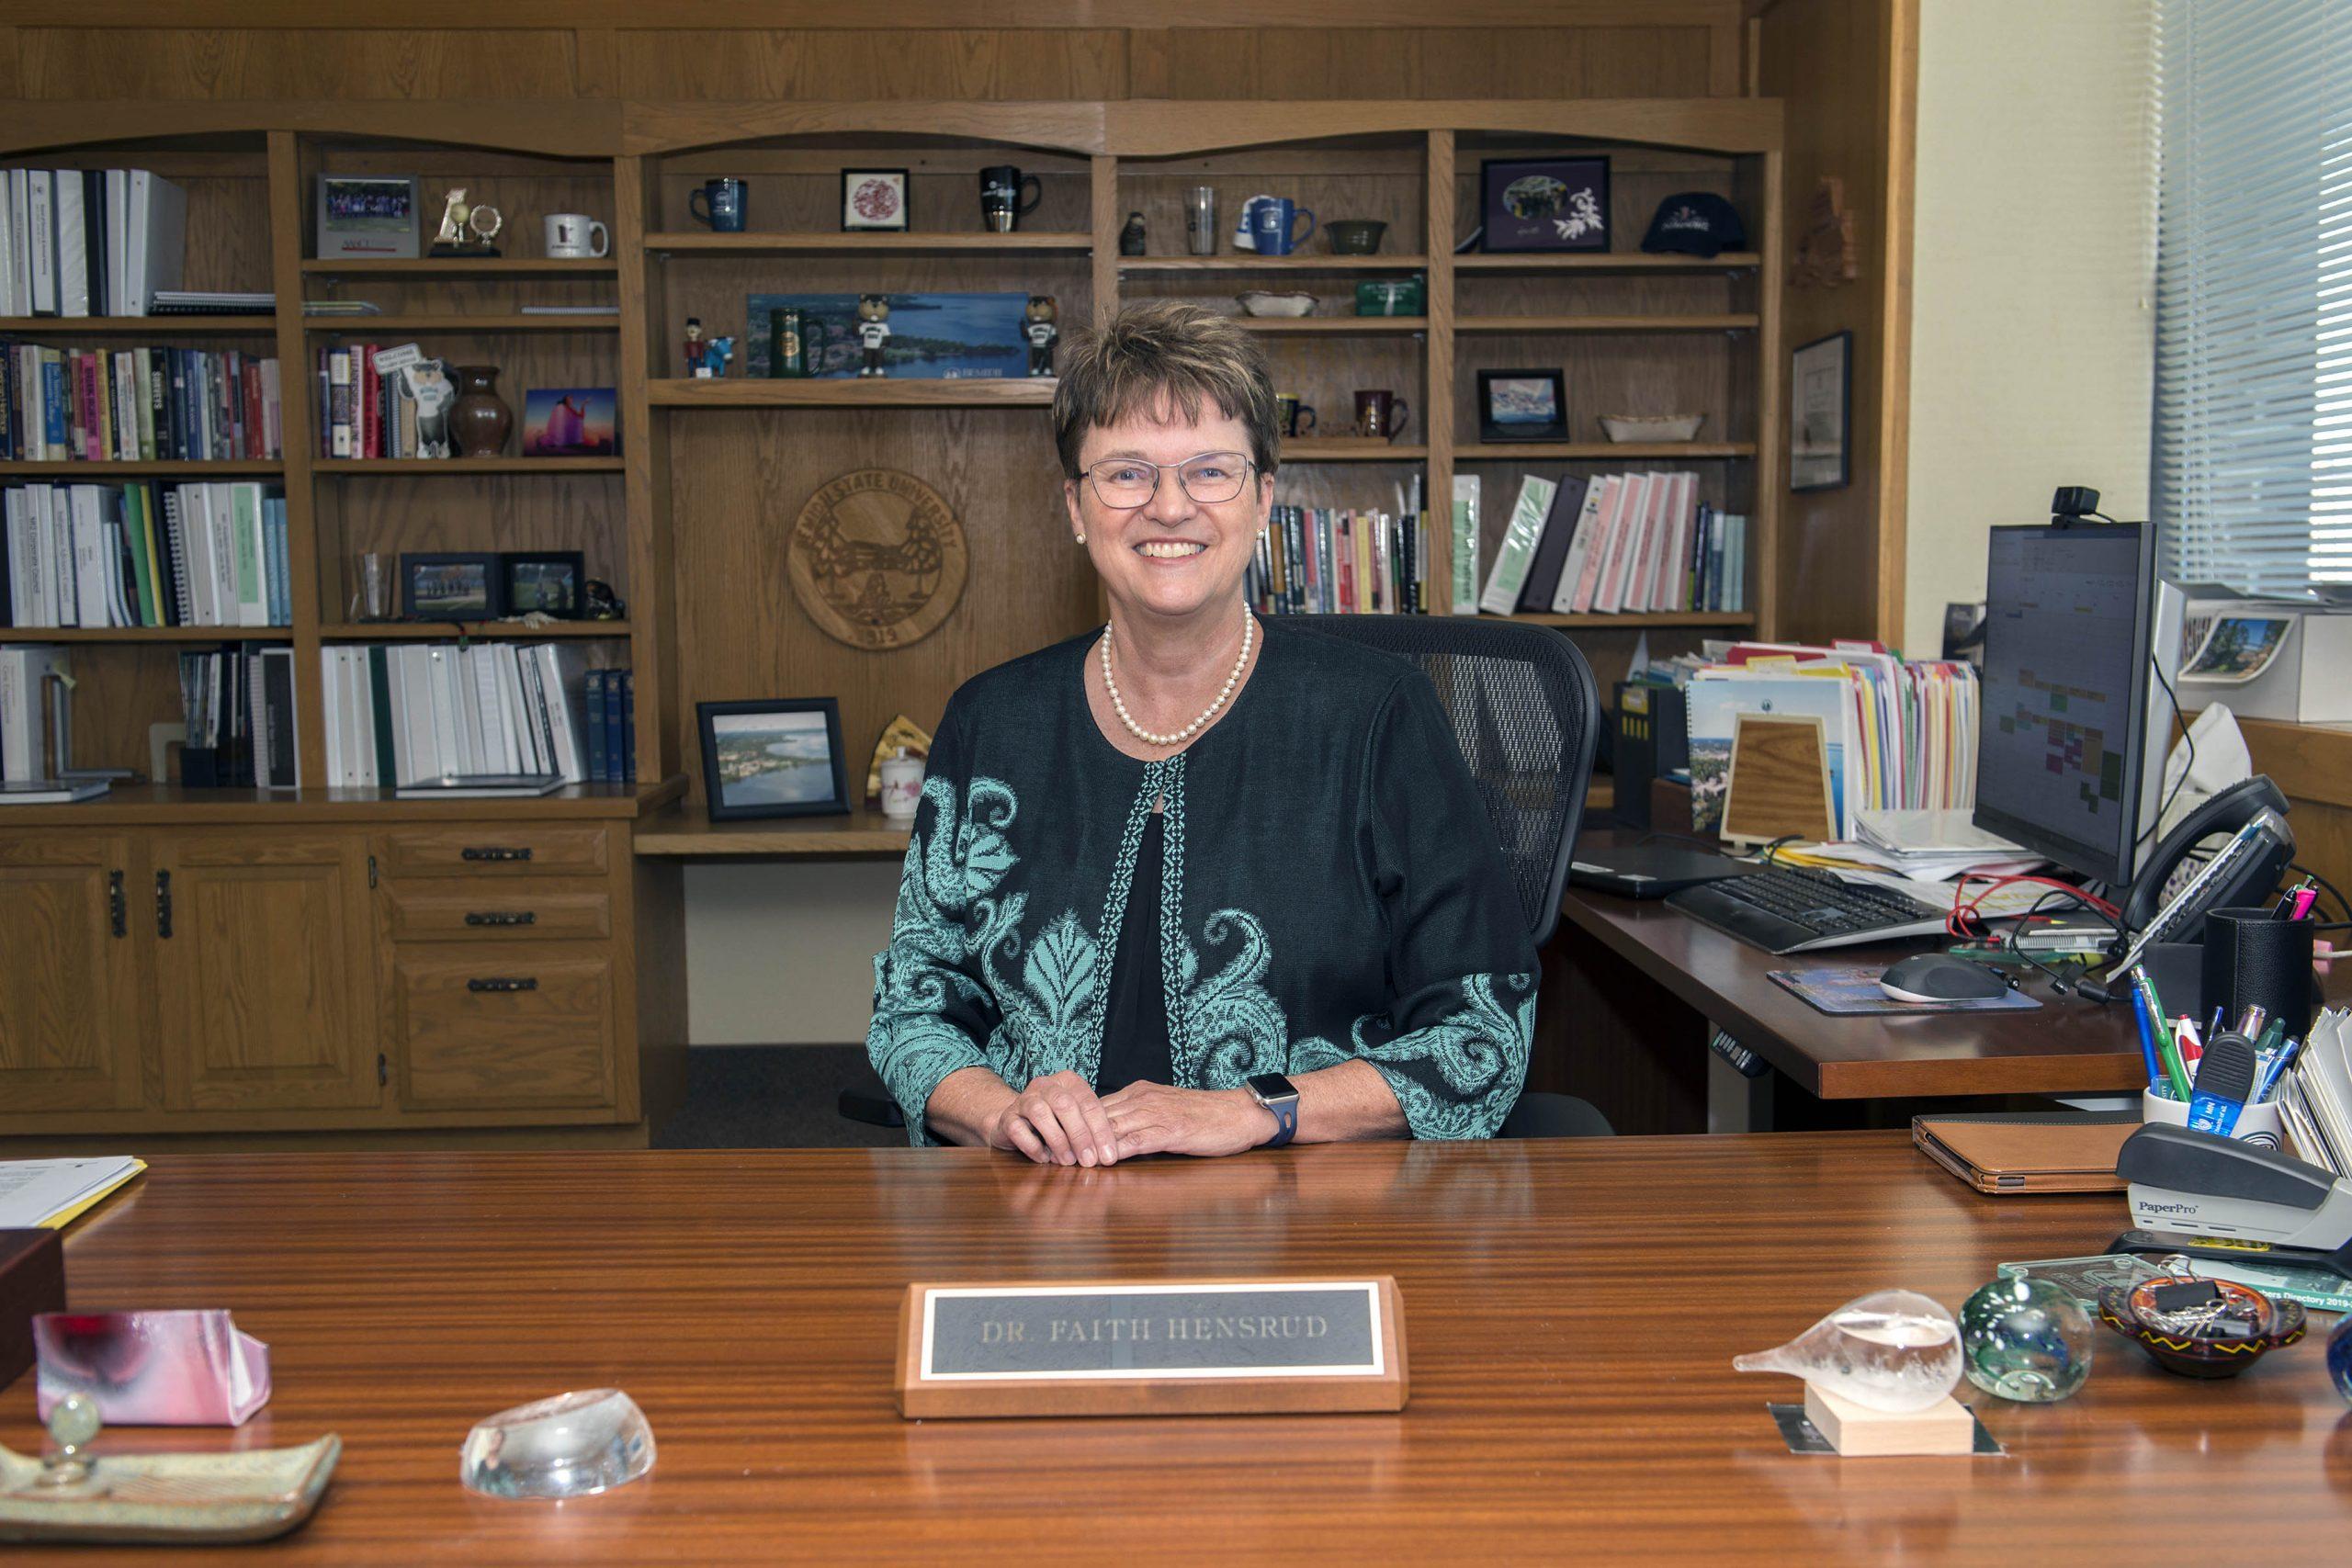 President Faith C. Hensrud in the BSU Presidential Office